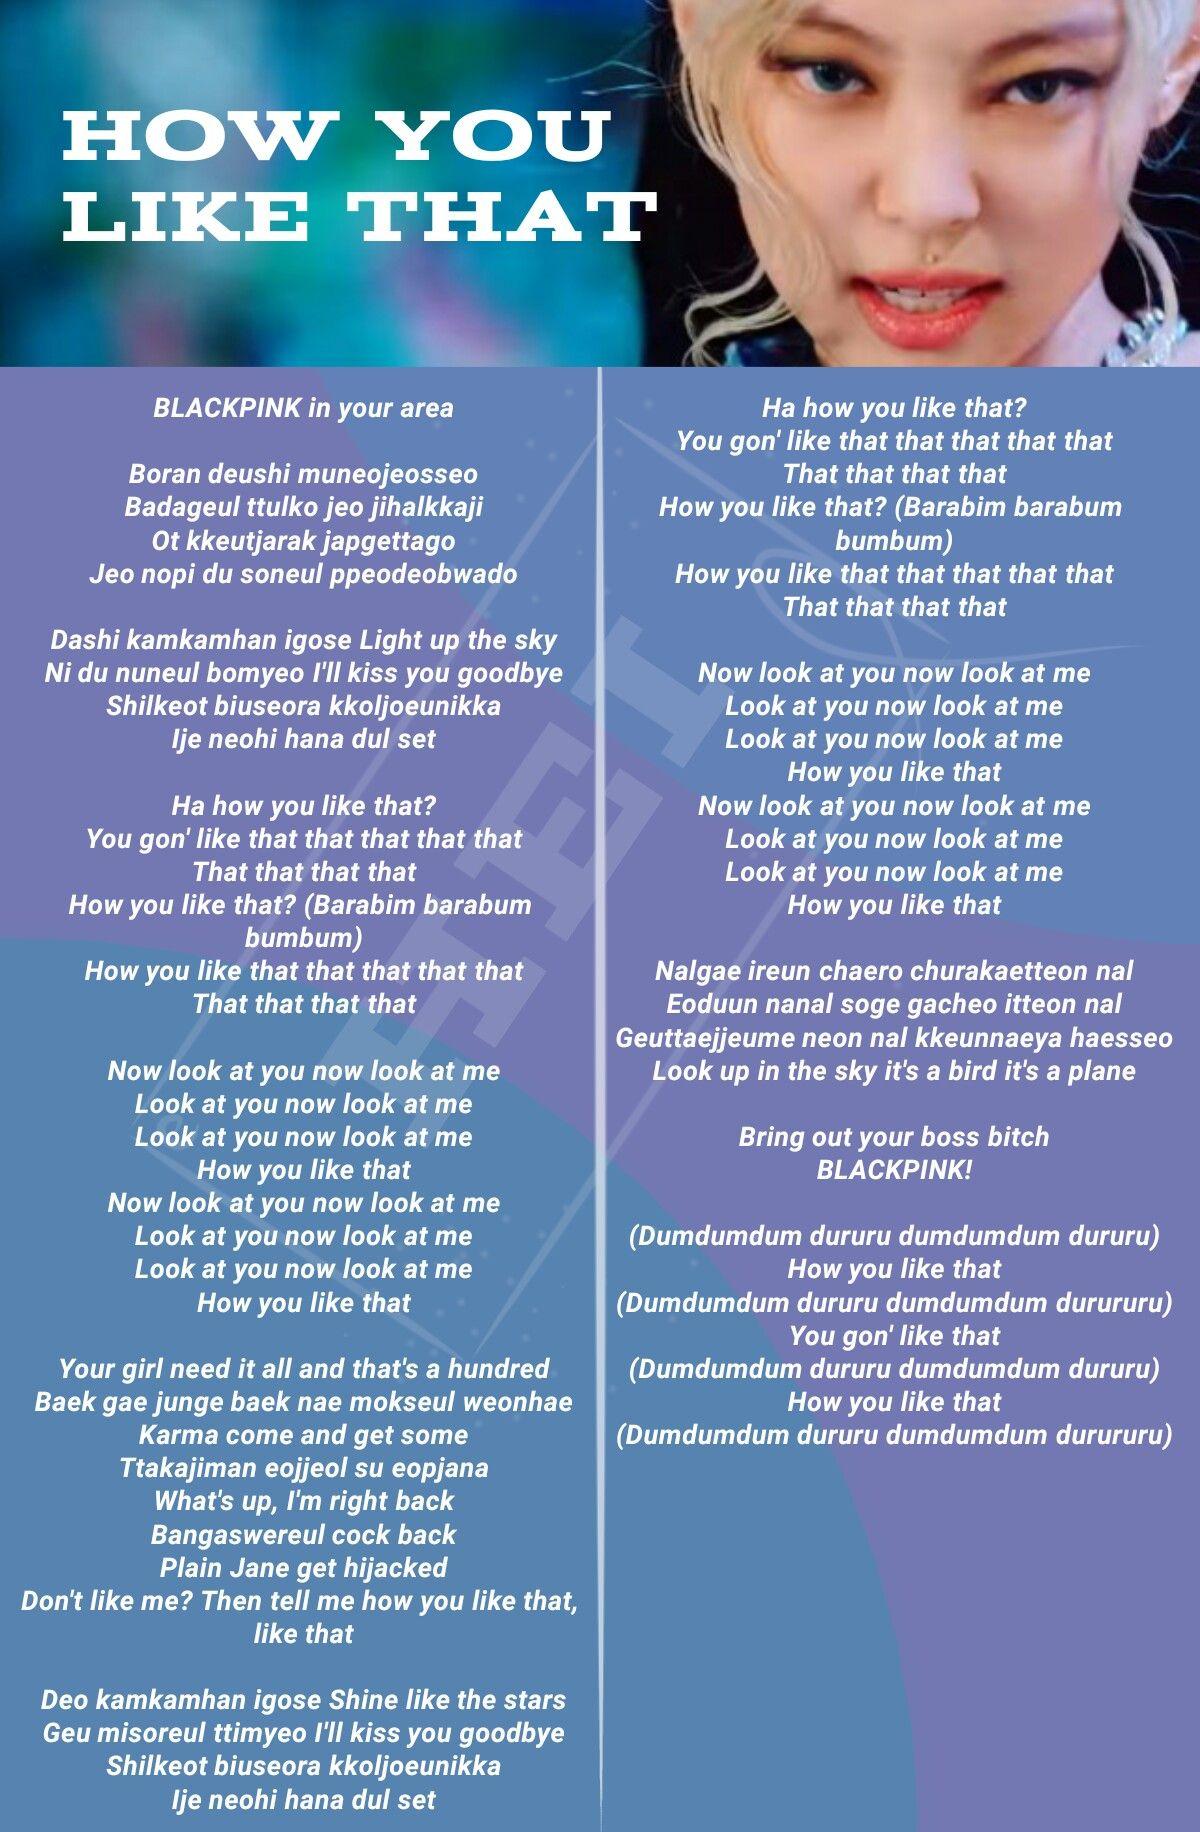 Blackpink How You Like That Easy Lyrics Kutipan Lirik Lirik Lagu Lagu